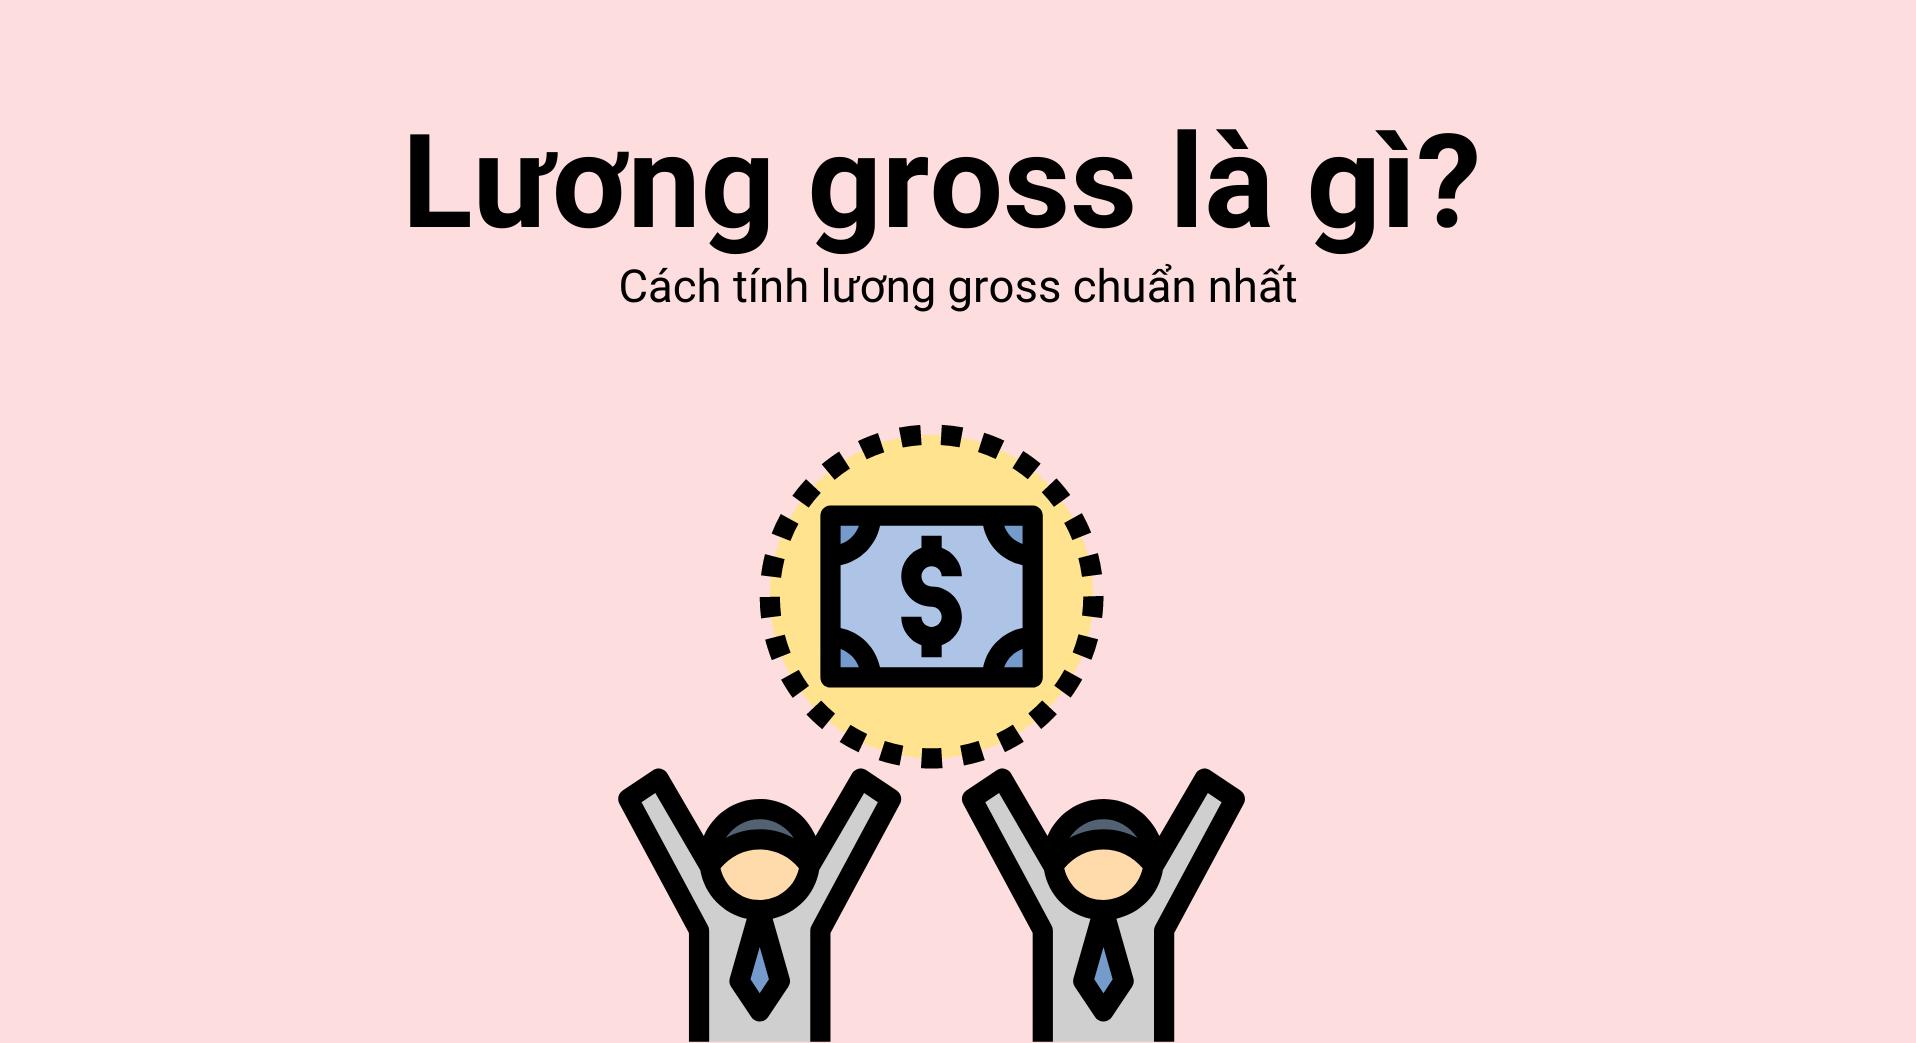 luong-gross-gom-nhung-gi